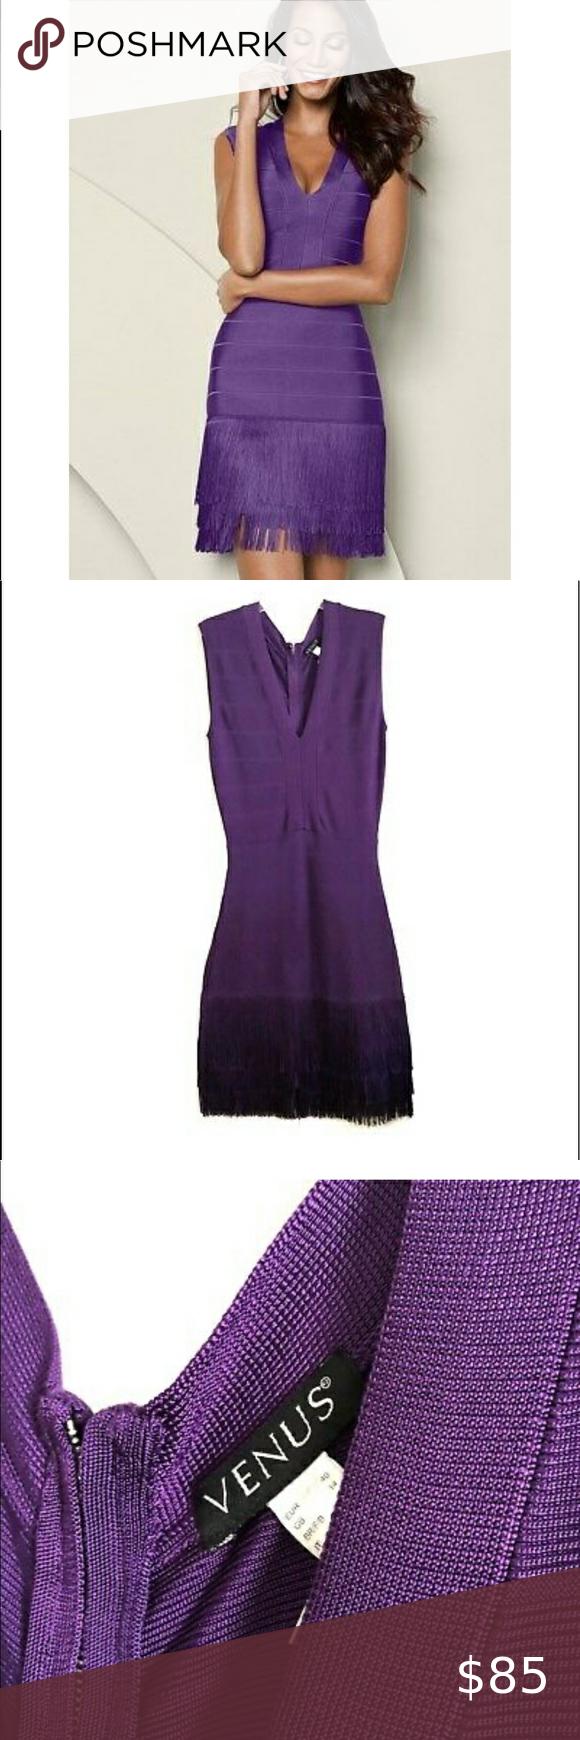 Venus Dark Purple Stretch Knit Fringe V Neck Dress V Neck Dress Navy Blue Midi Dress Blue Sleeveless Dress [ 1740 x 580 Pixel ]